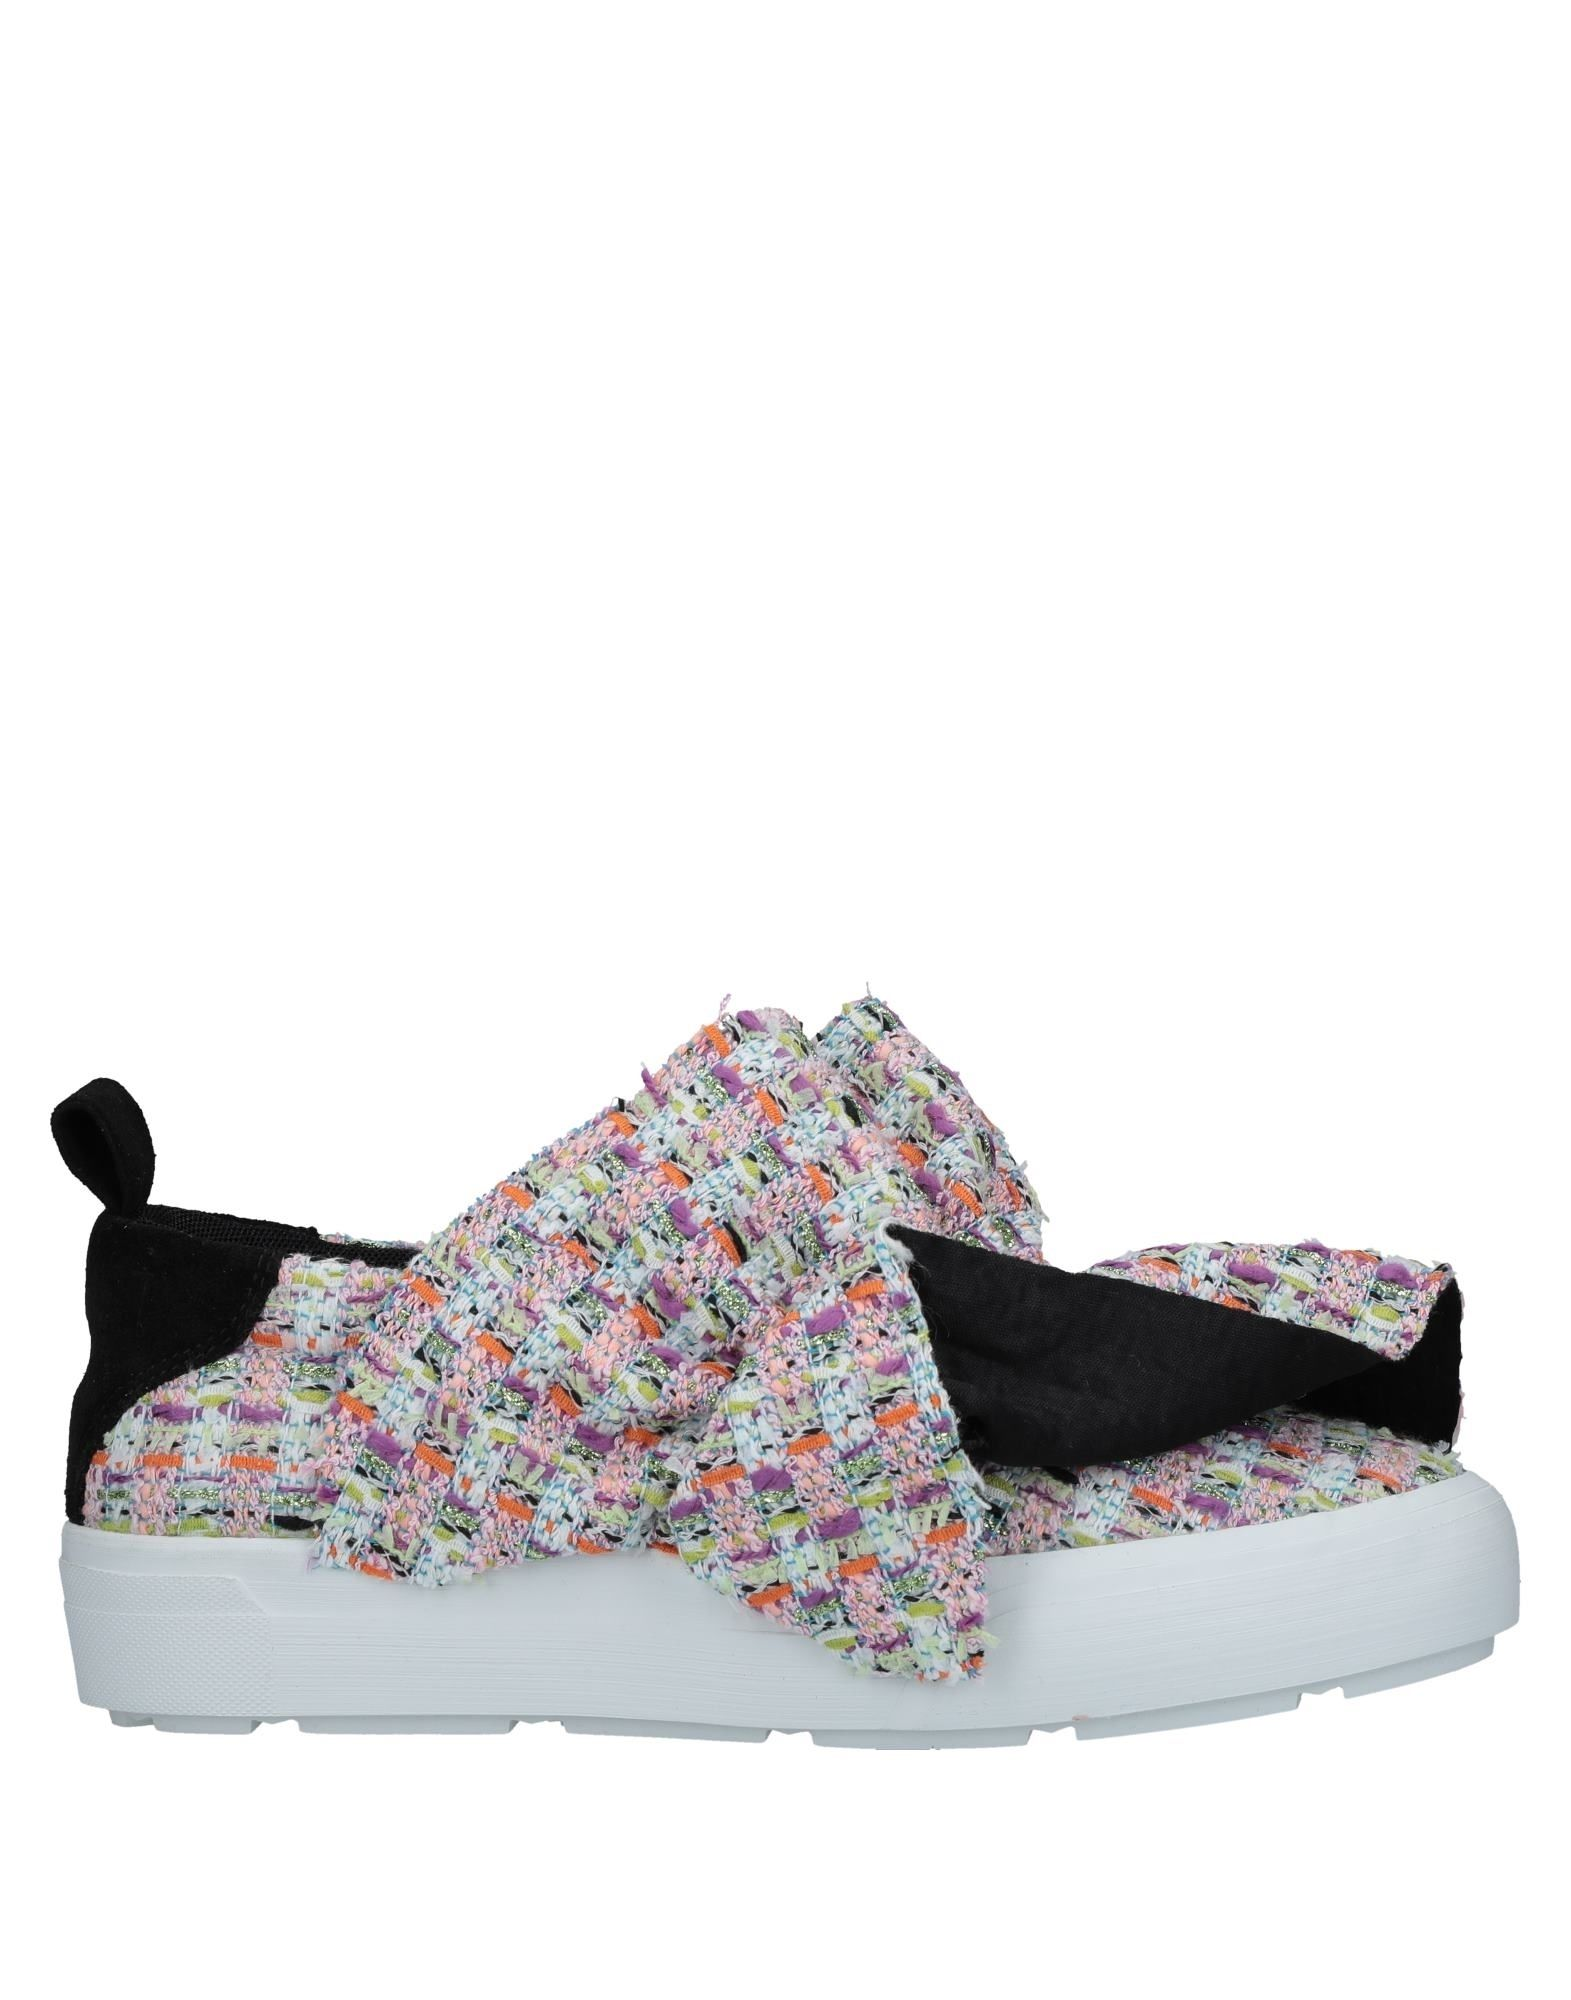 Msgm Heiße Sneakers Damen  11528149BV Heiße Msgm Schuhe a1e9b5